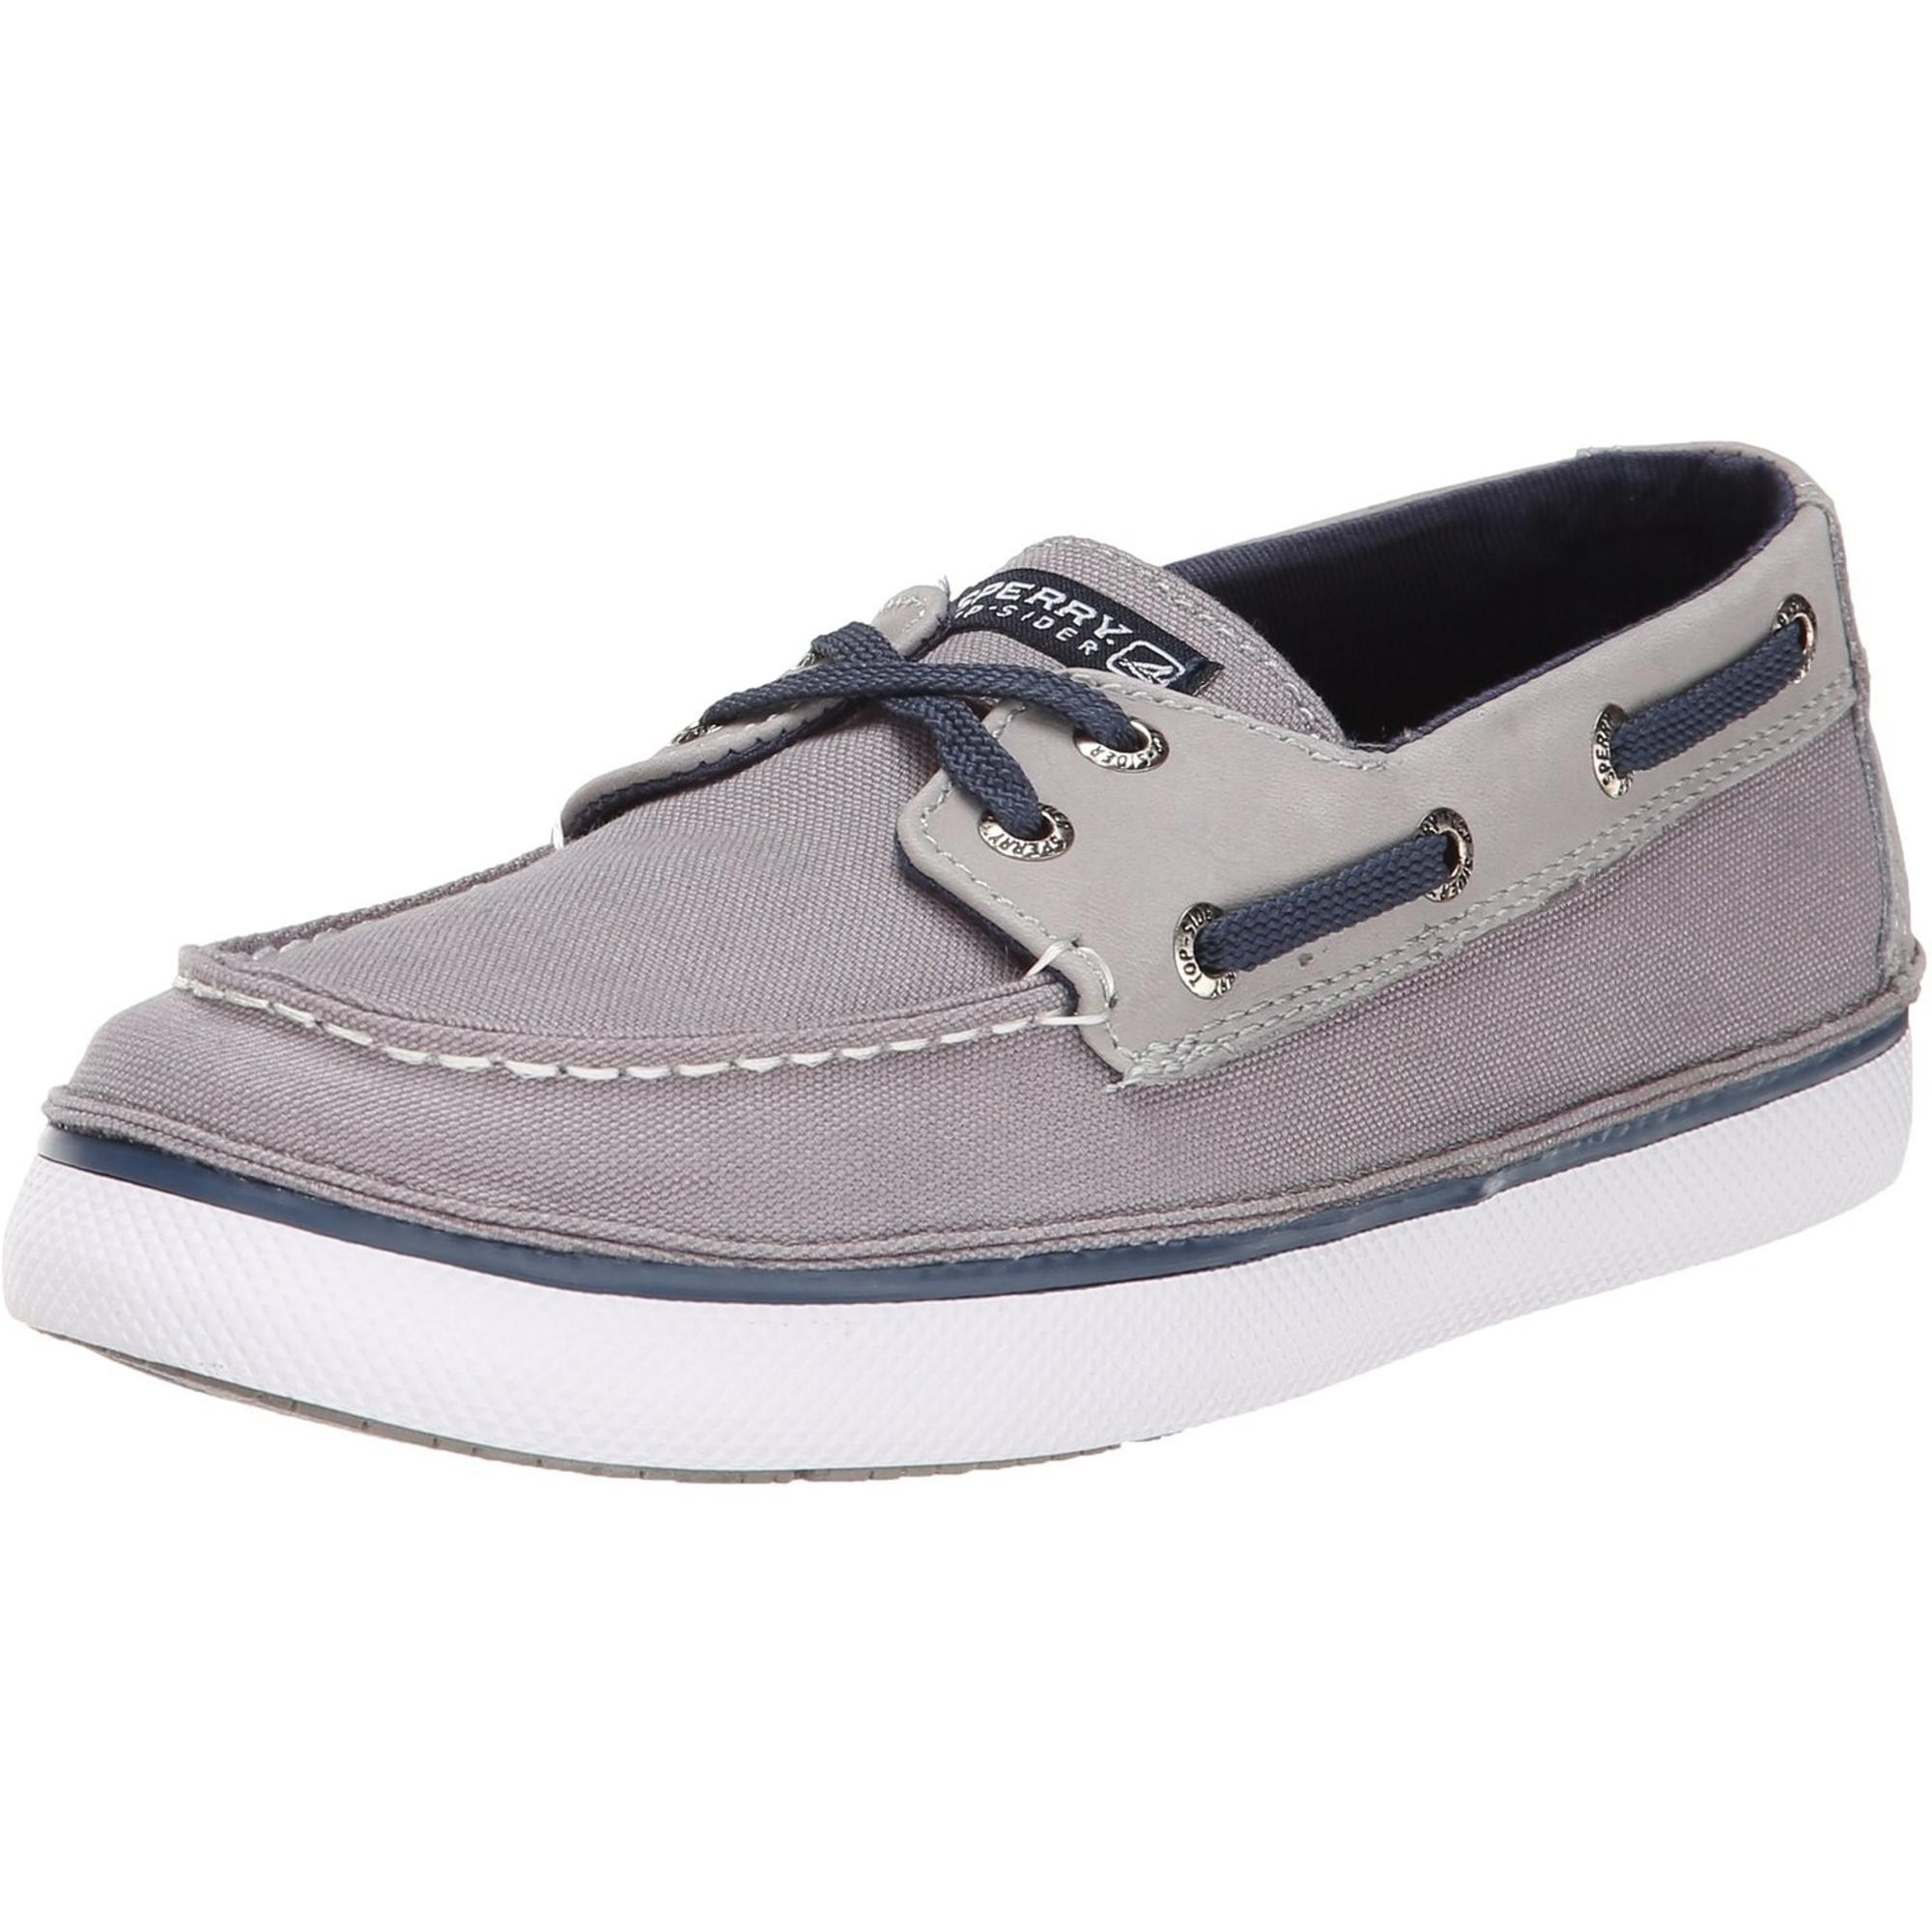 zapatos skechers santa cruz bolivia historia mexico